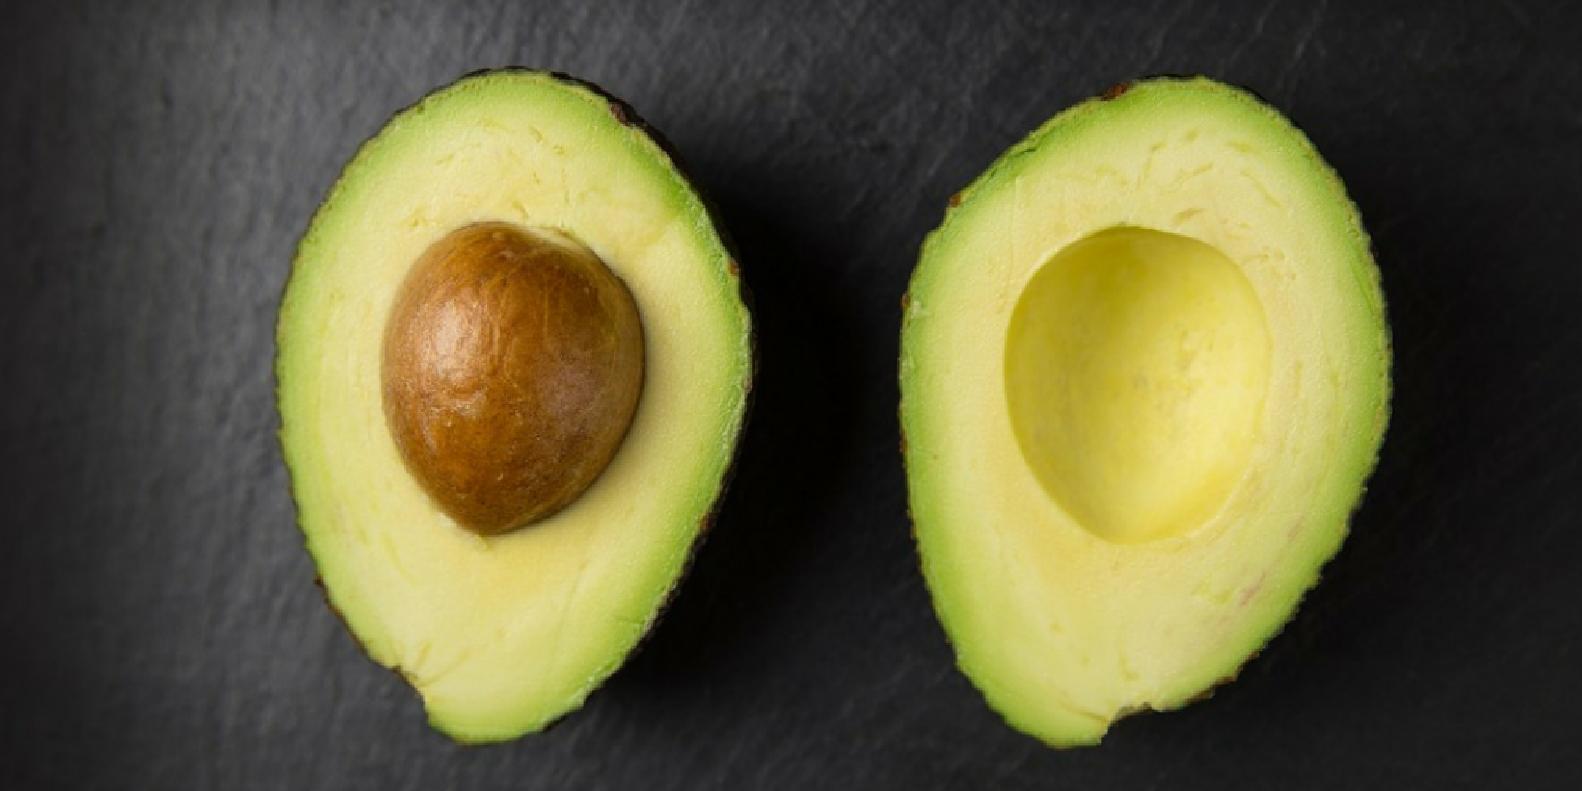 Chemists Find Big Medicinal Potential in Avocado Seed Husks | Cancer